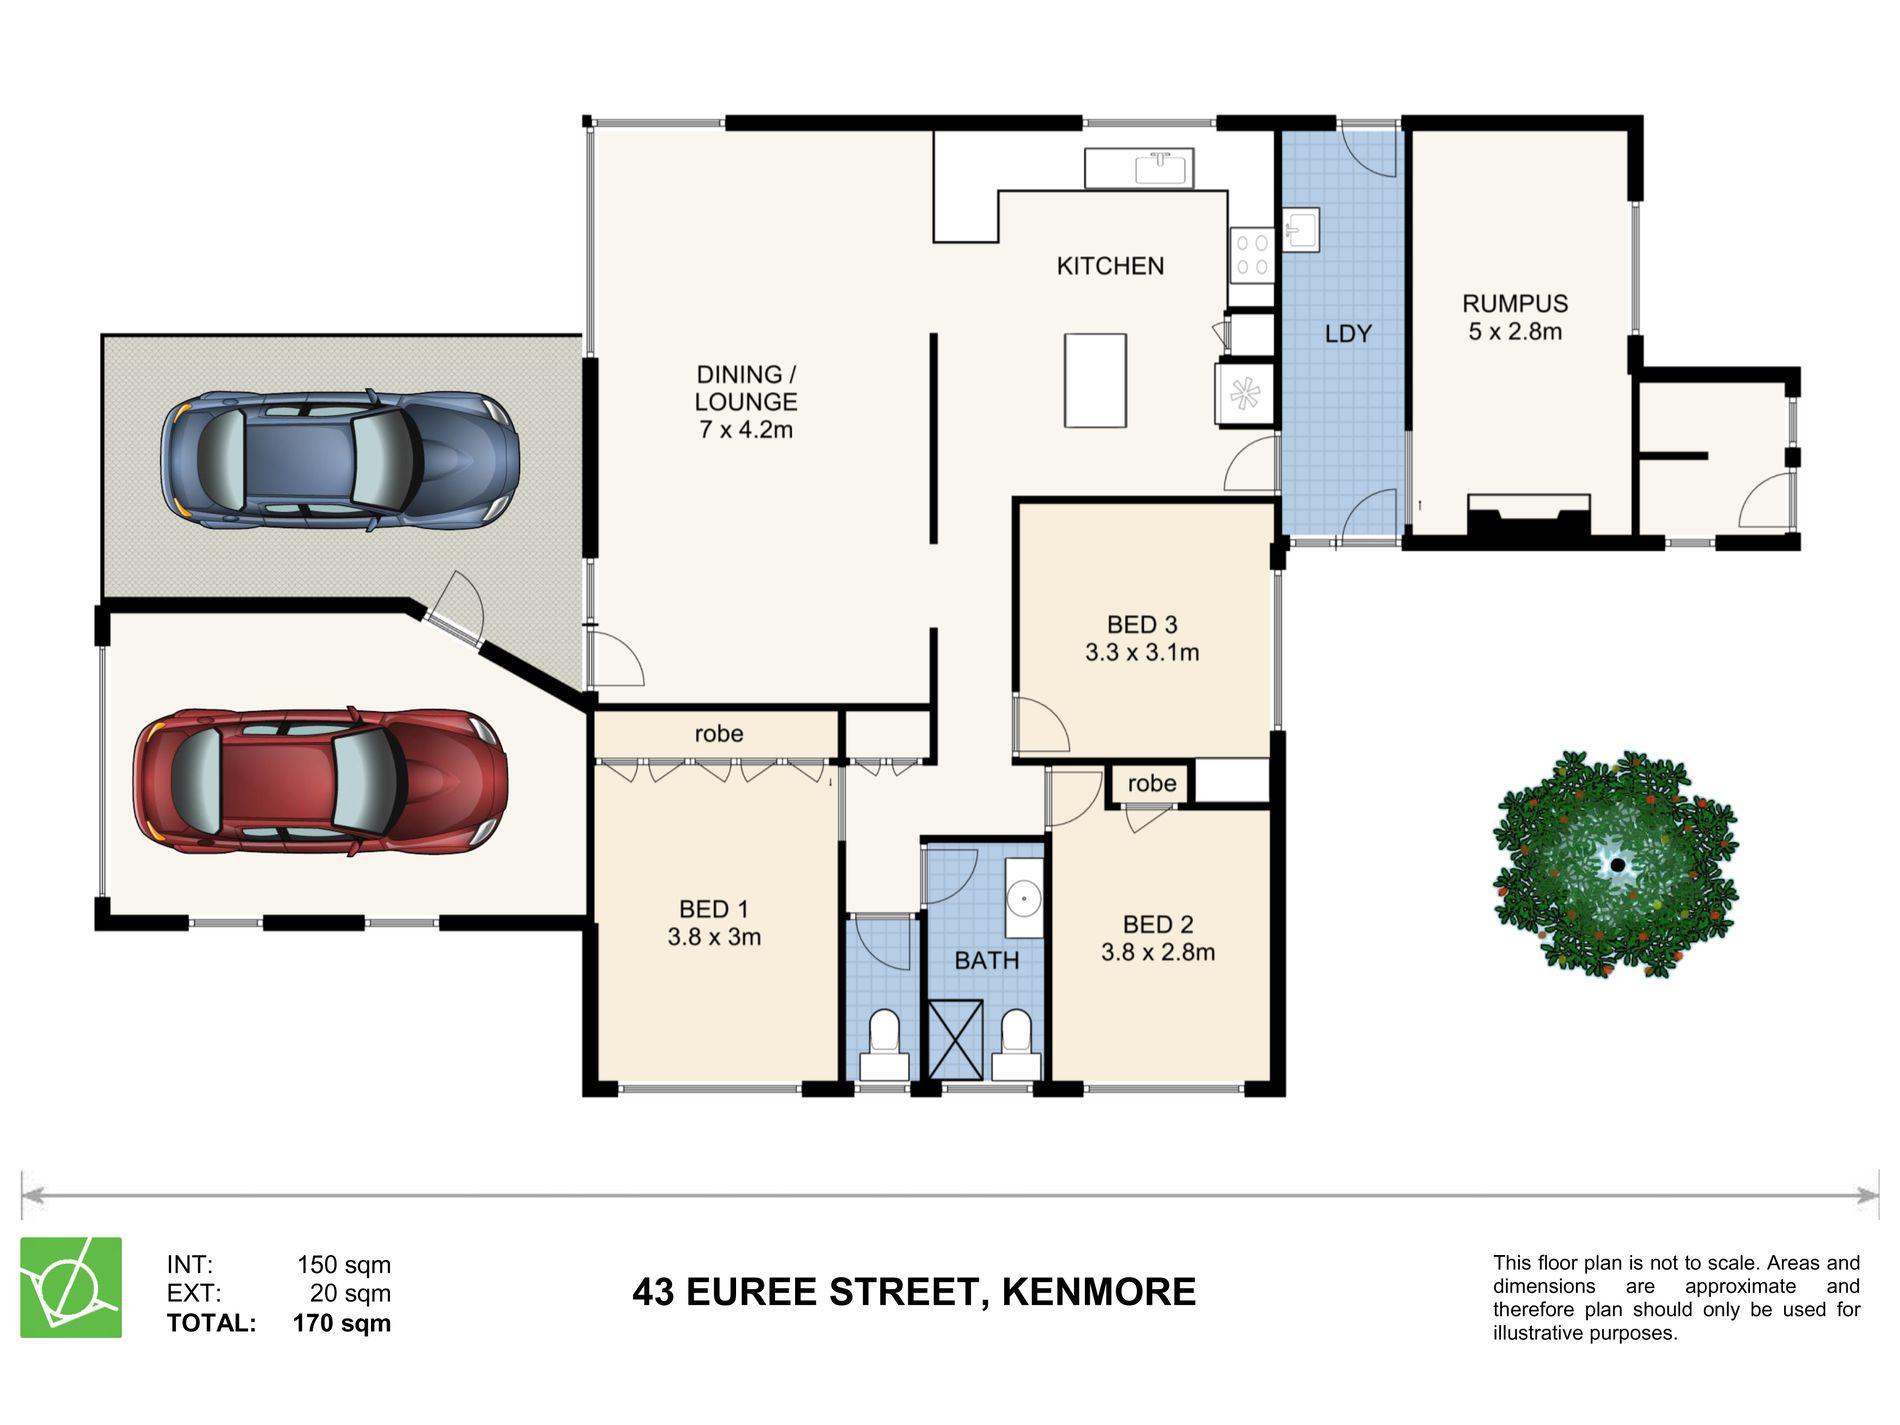 43 Euree Street, Kenmore